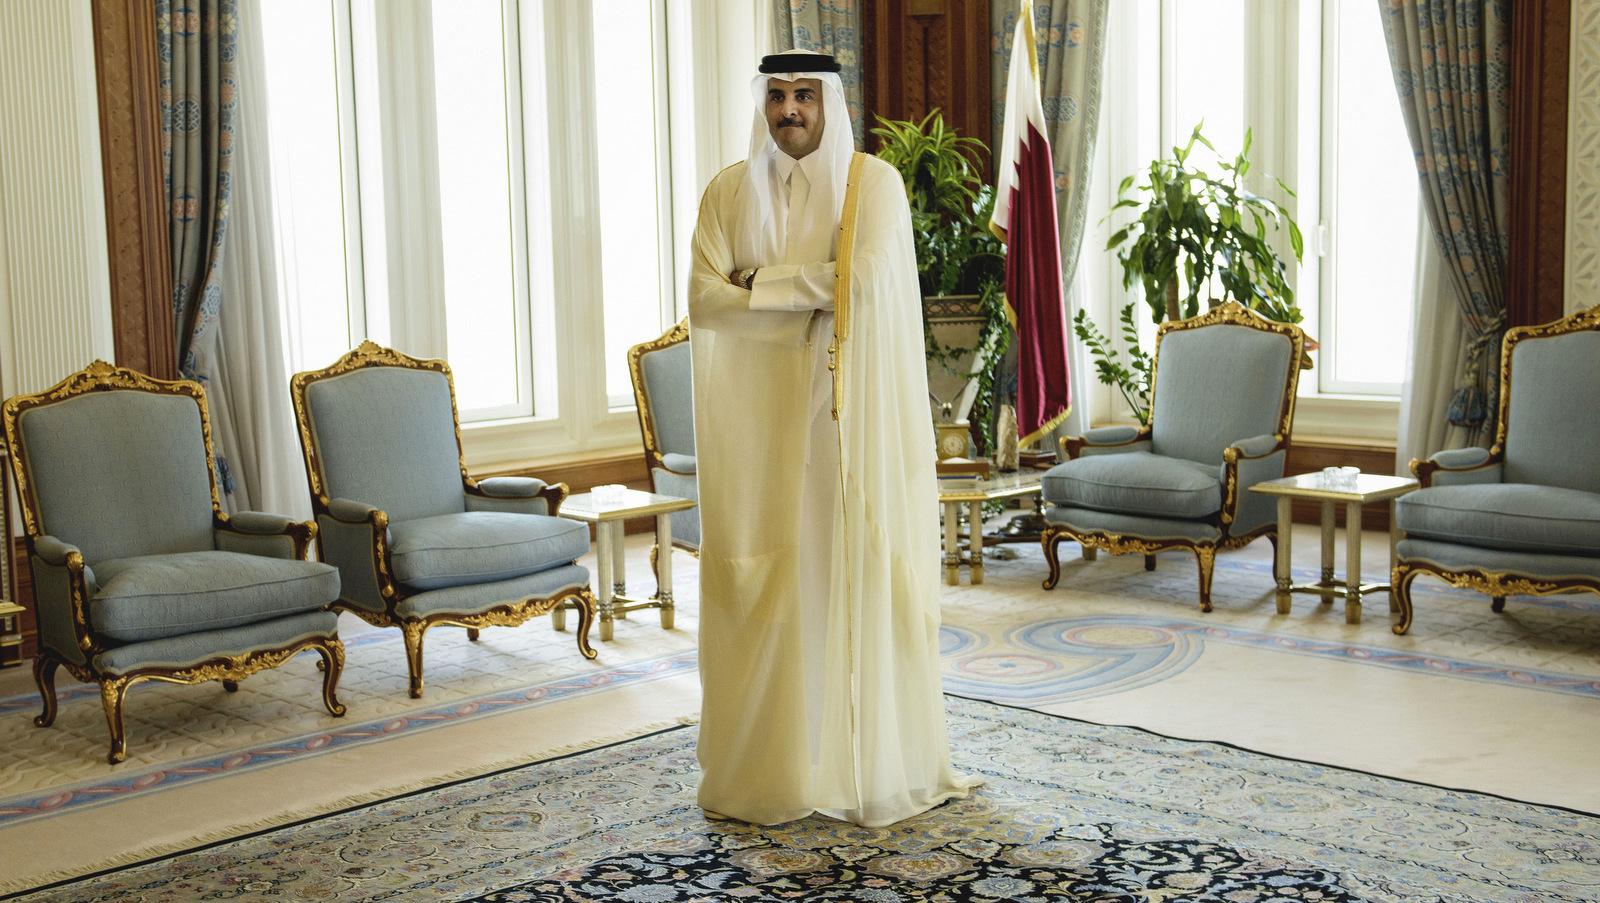 Qatar Emir Sheik Tamim bin Hamad Al-Thani waits for the arrival of U.S. Secretary of State John Kerry ahead of their meeting, at Diwan Palace in Doha, Qatar. (Brendan Smialowski/AP)